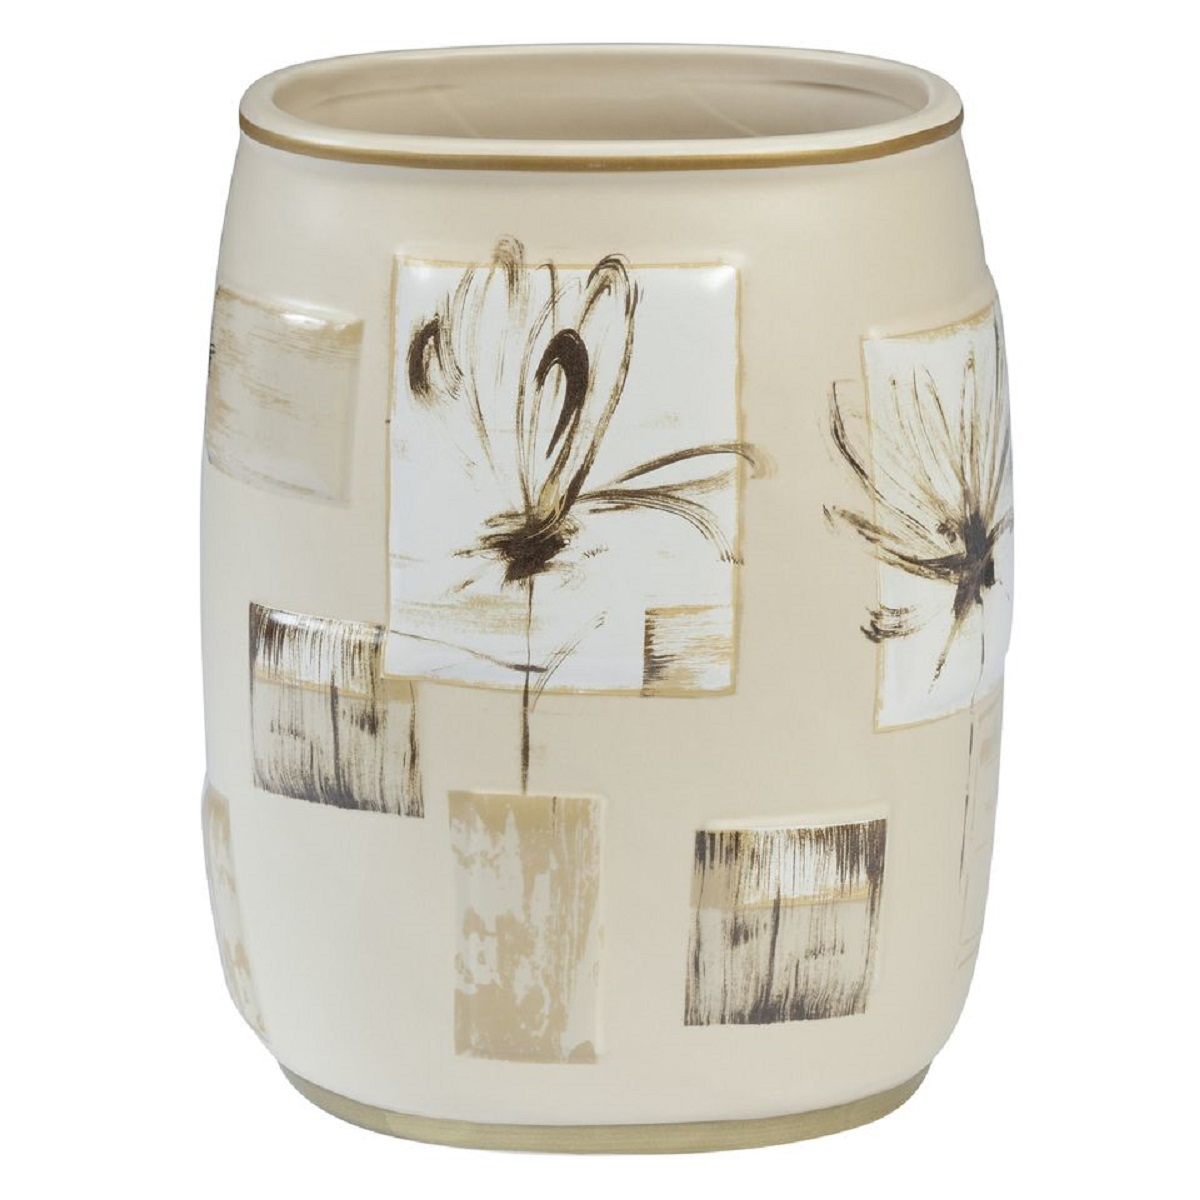 Мусорное ведро Creative Bath Botanical Collage, бежевый мыльница creative bath botanical dairy btl56mult